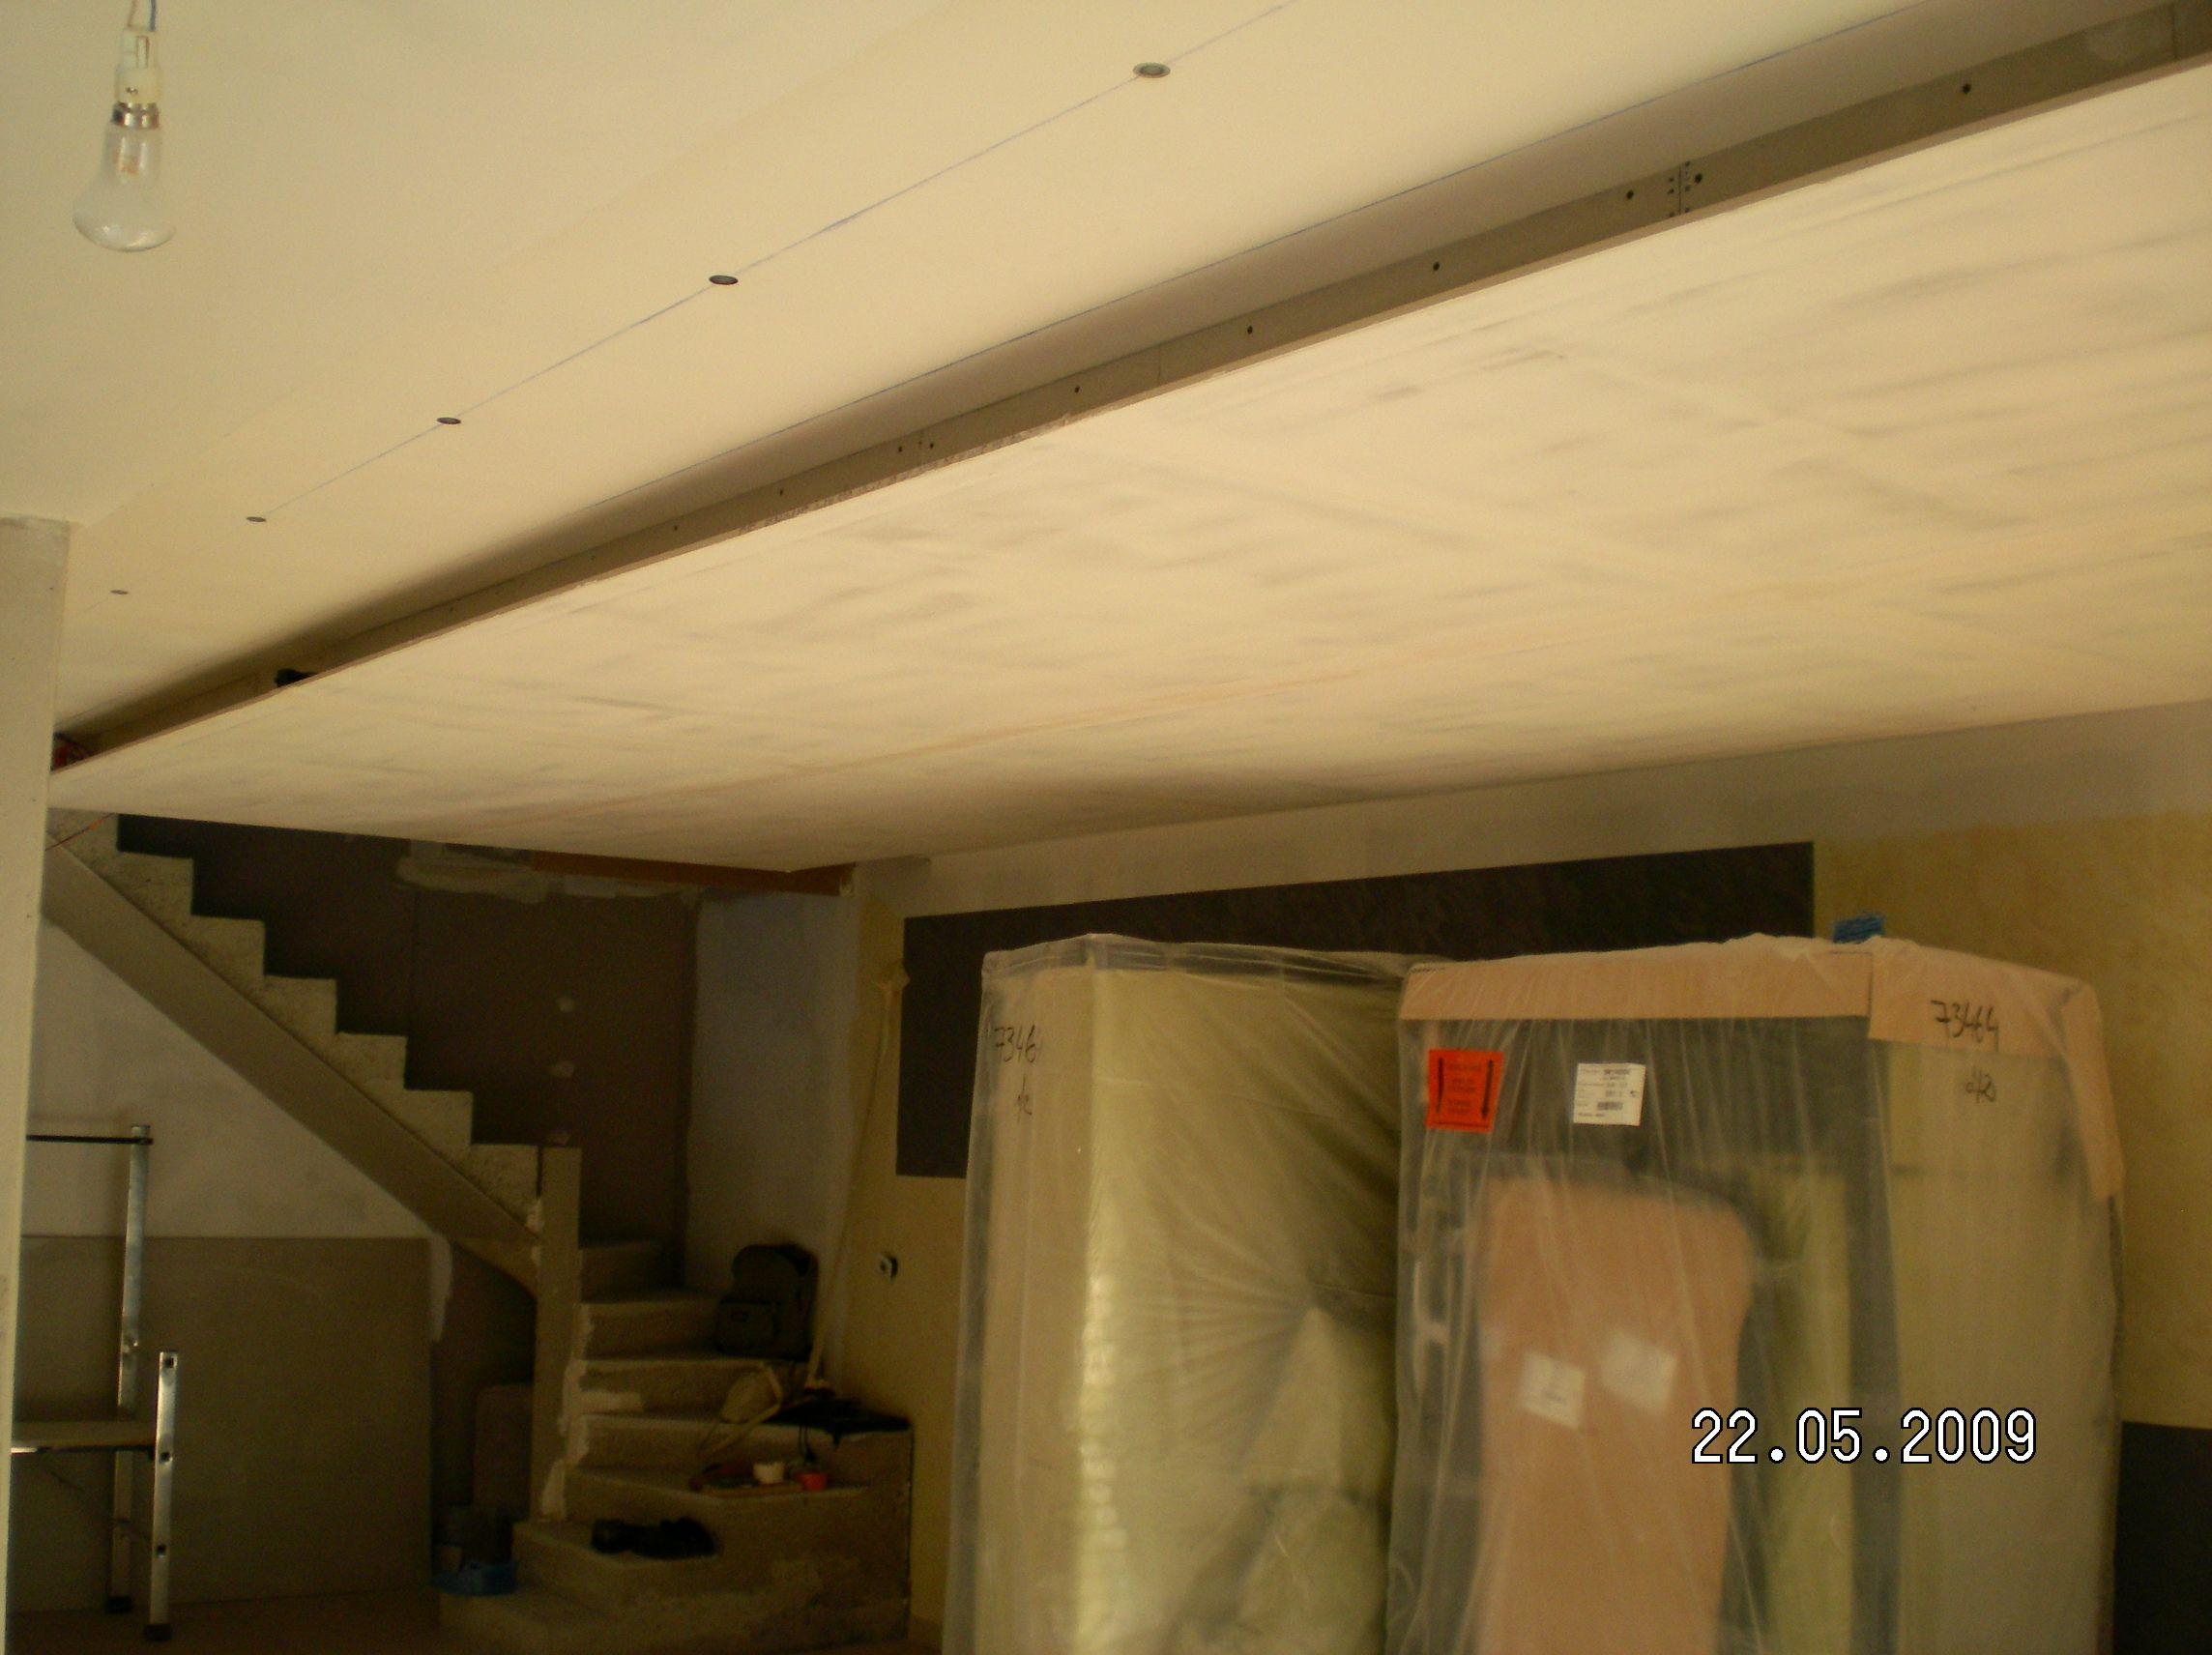 eclairage indirect de faux plafond 6 messages for the home pinterest. Black Bedroom Furniture Sets. Home Design Ideas